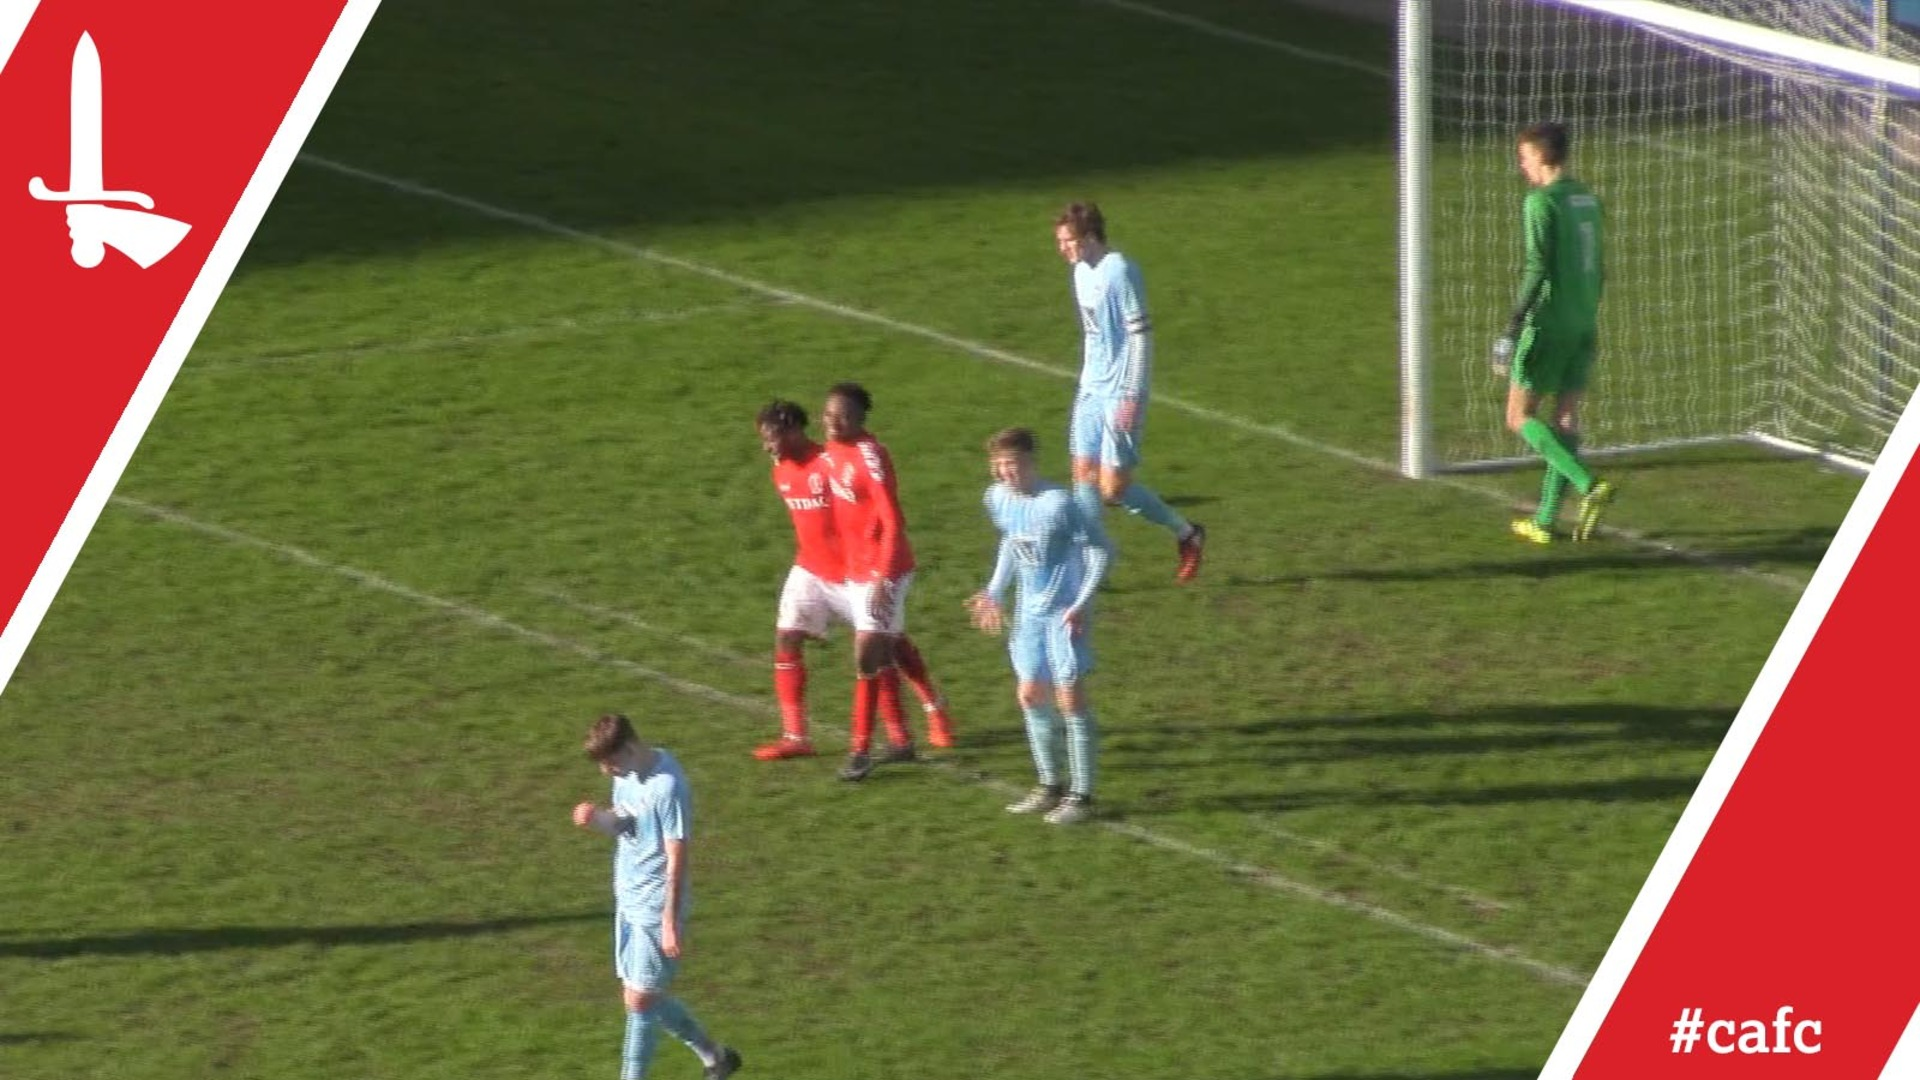 U23S HIGHLIGHTS | Coventry City 0 Charlton 2